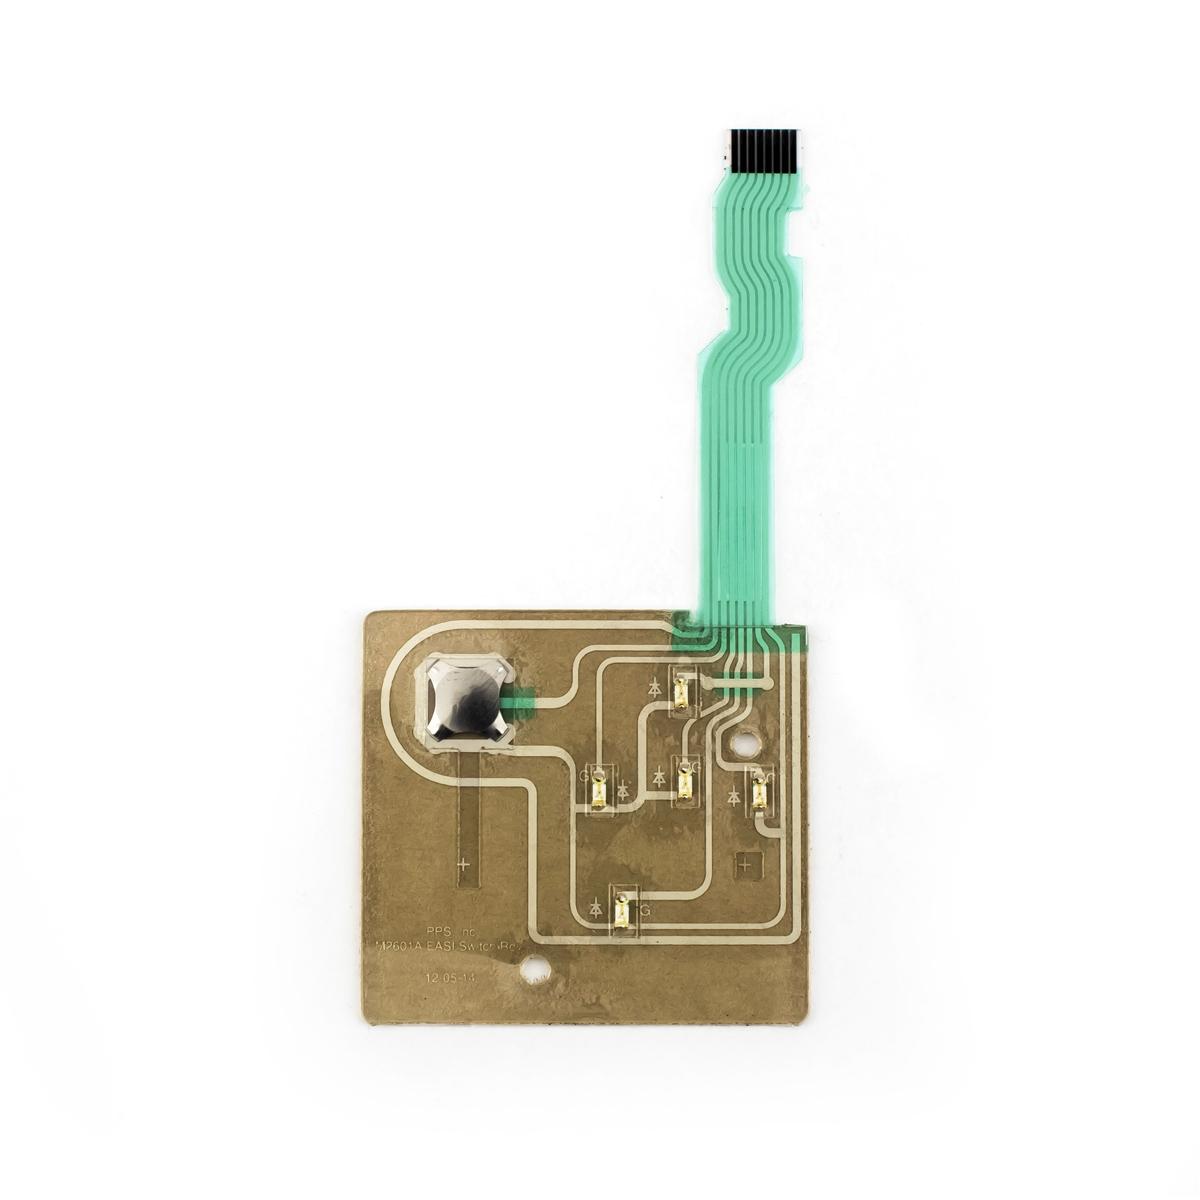 Philips M2601A Series C EASI Telemetry Transmitter LED Flex Board